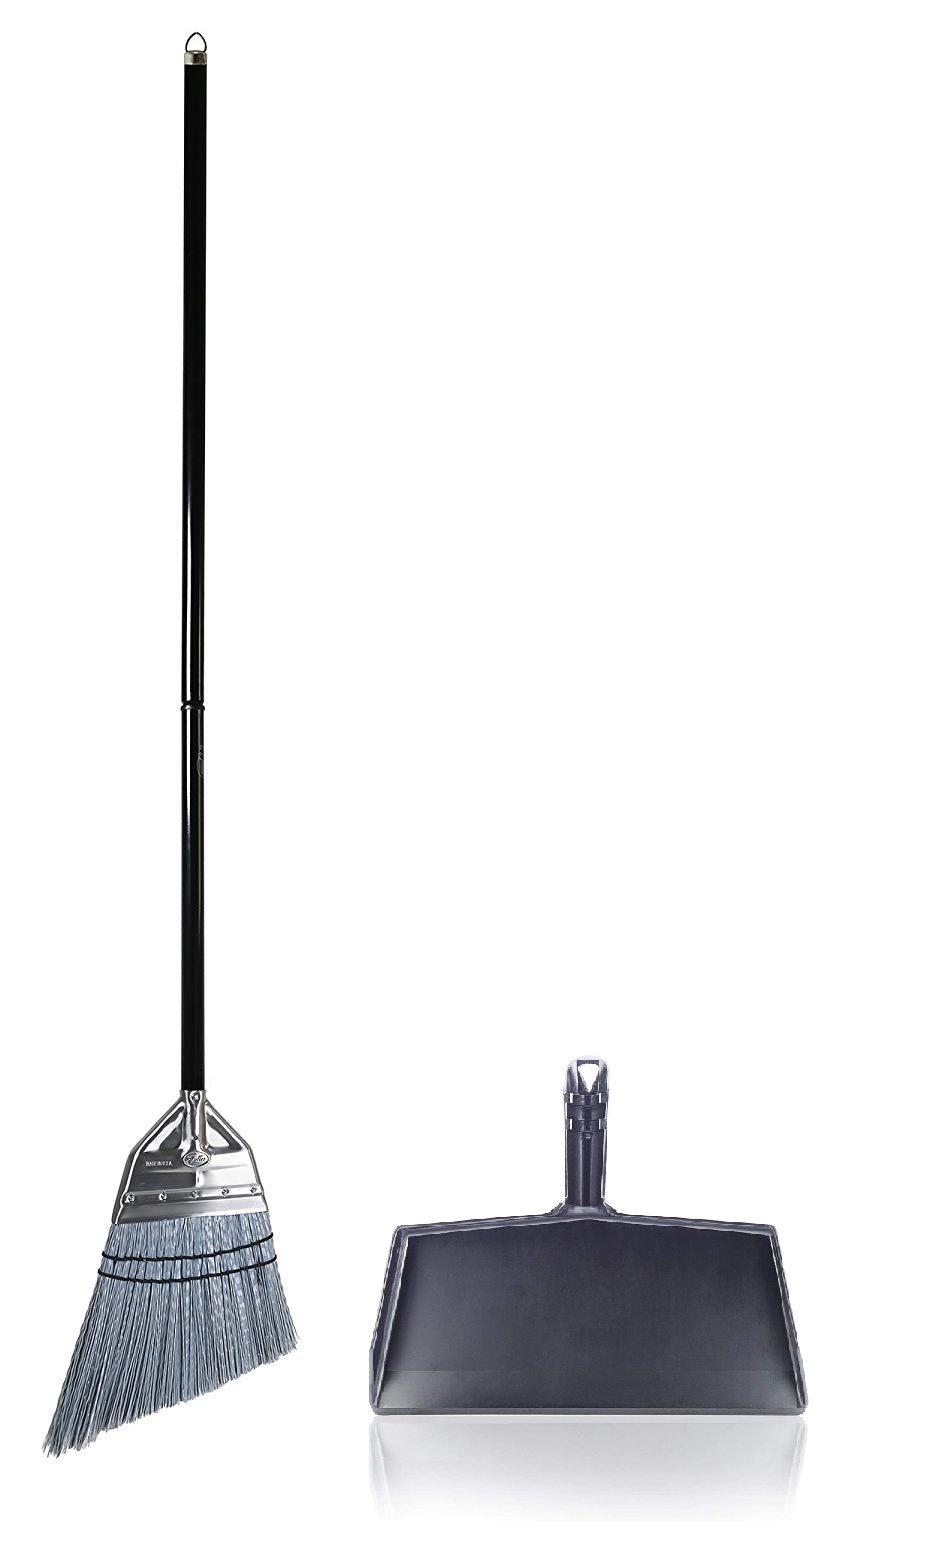 Fuller Brush Angle Broom with Clip-On Dustpan by Fuller Brush